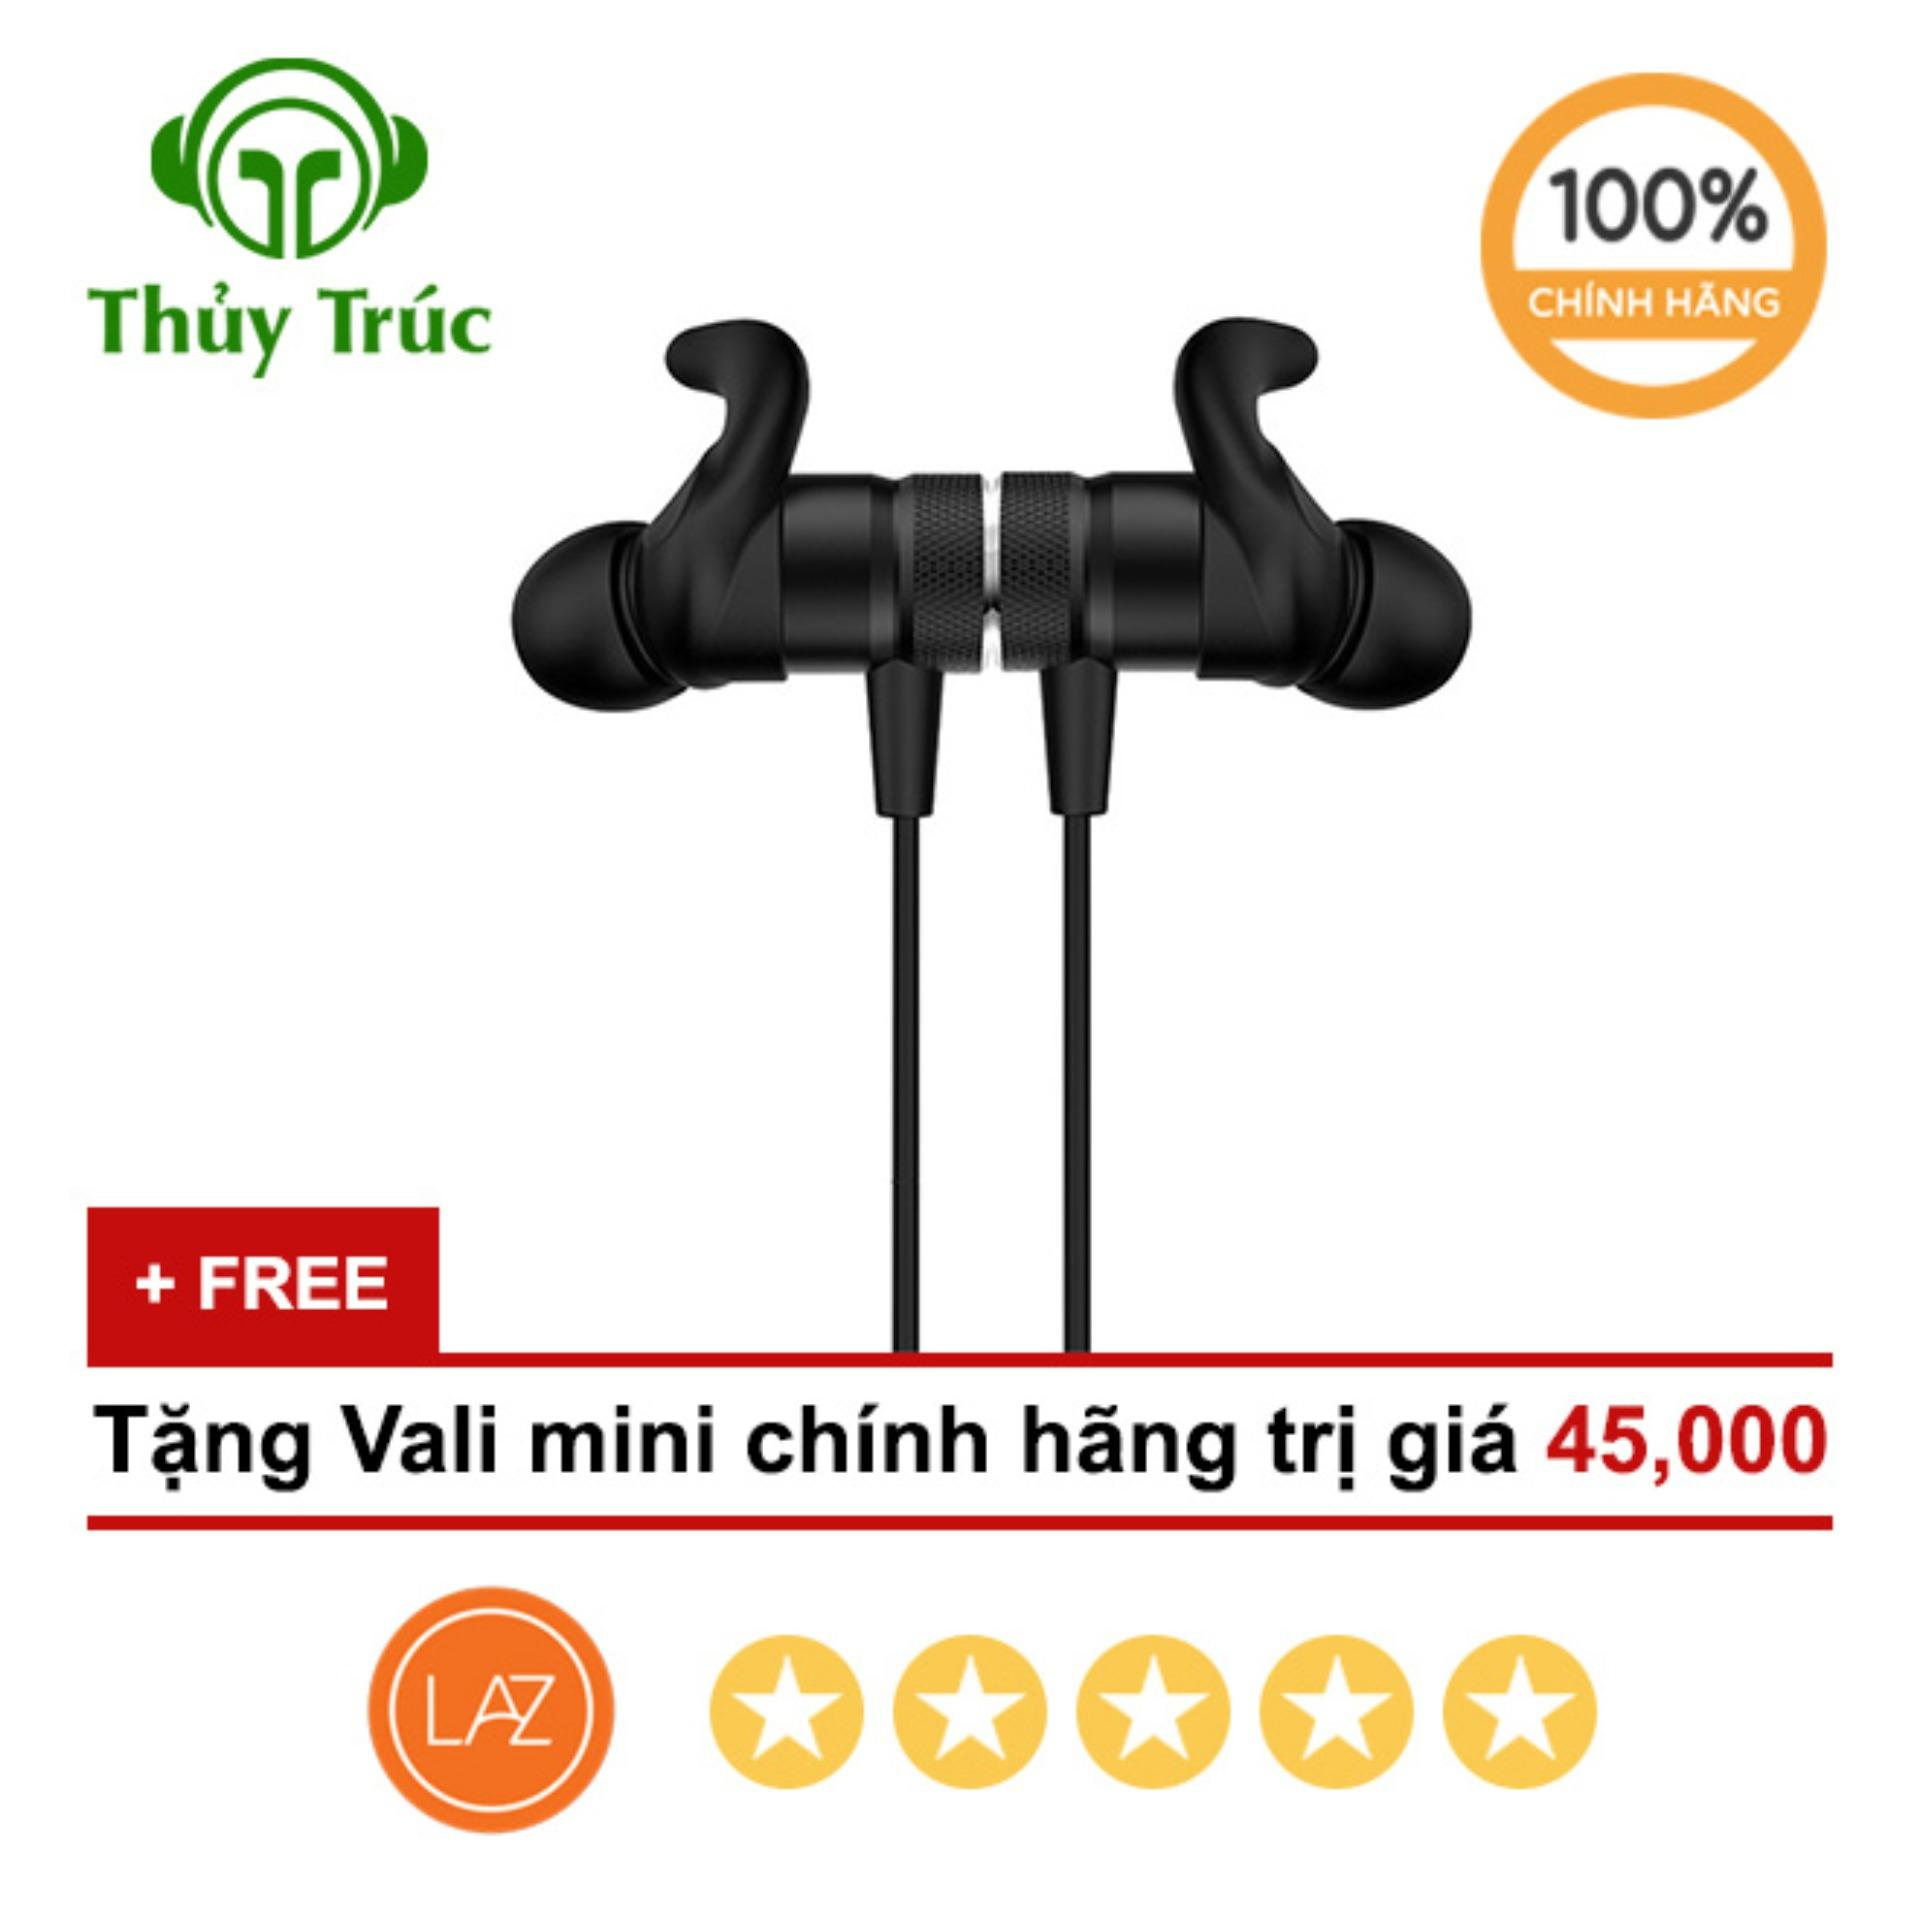 Chiết Khấu Tai Nghe Thể Thao Bluetooth Hoco Es8 Hoco Vietnam